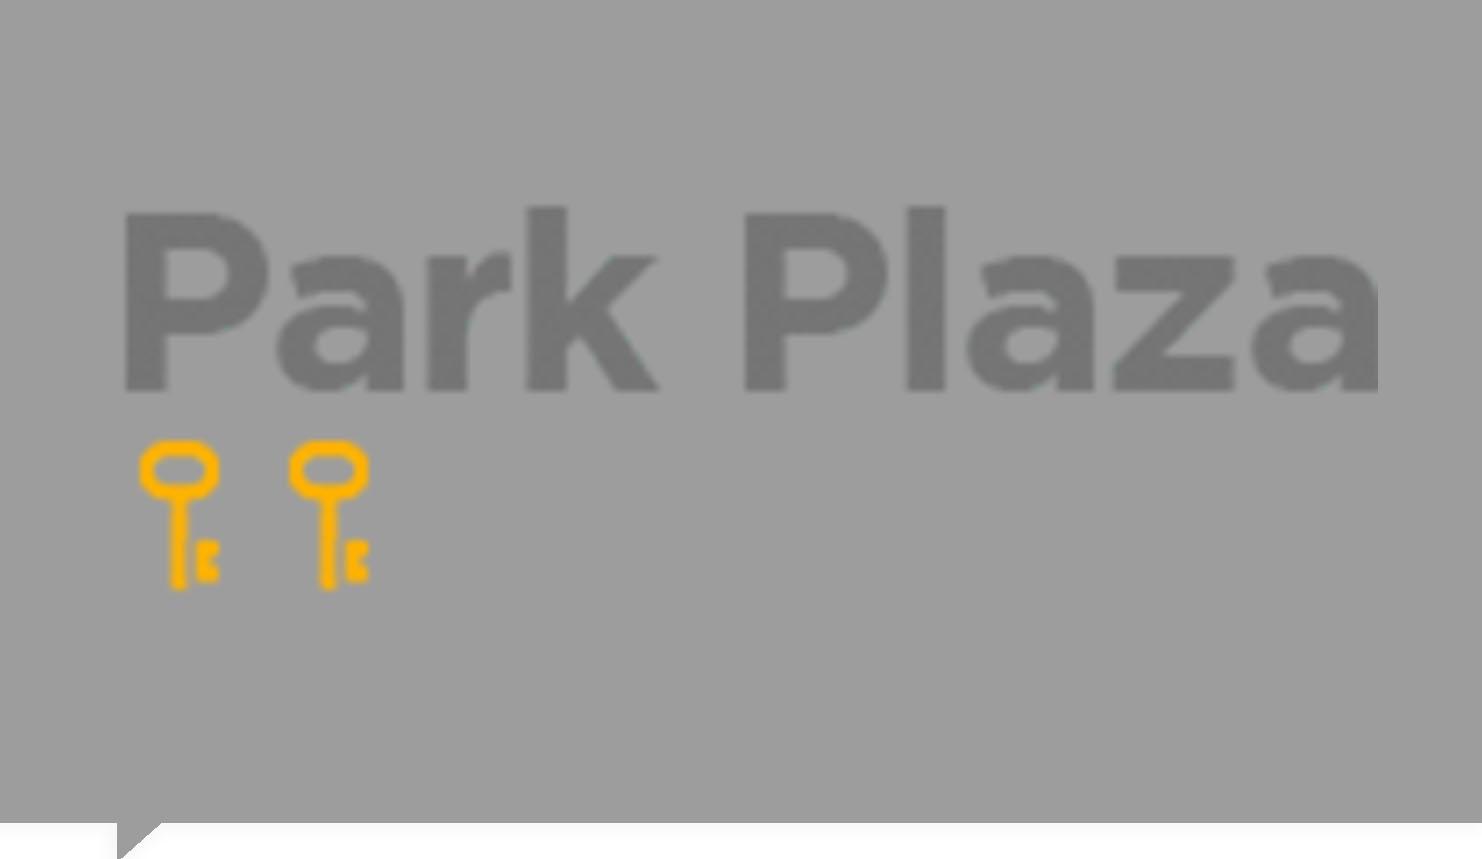 Wifi: Apartamentos Park Plaza (Tenerife)